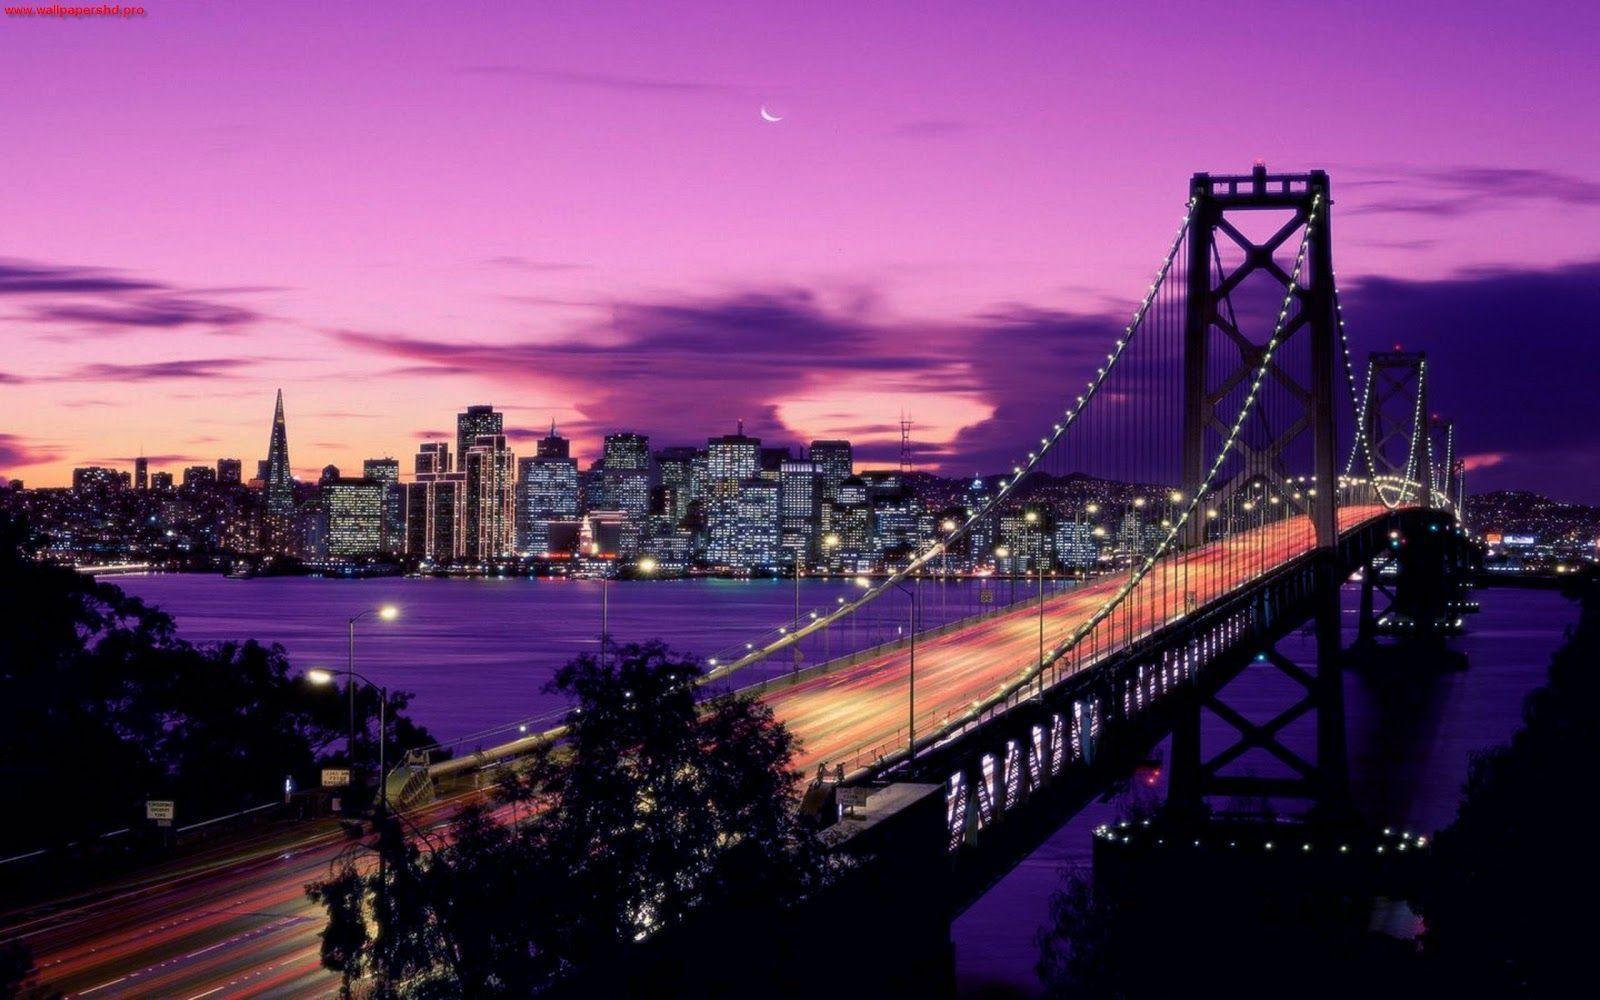 San Francisco Wallpapers HD 1600x1000